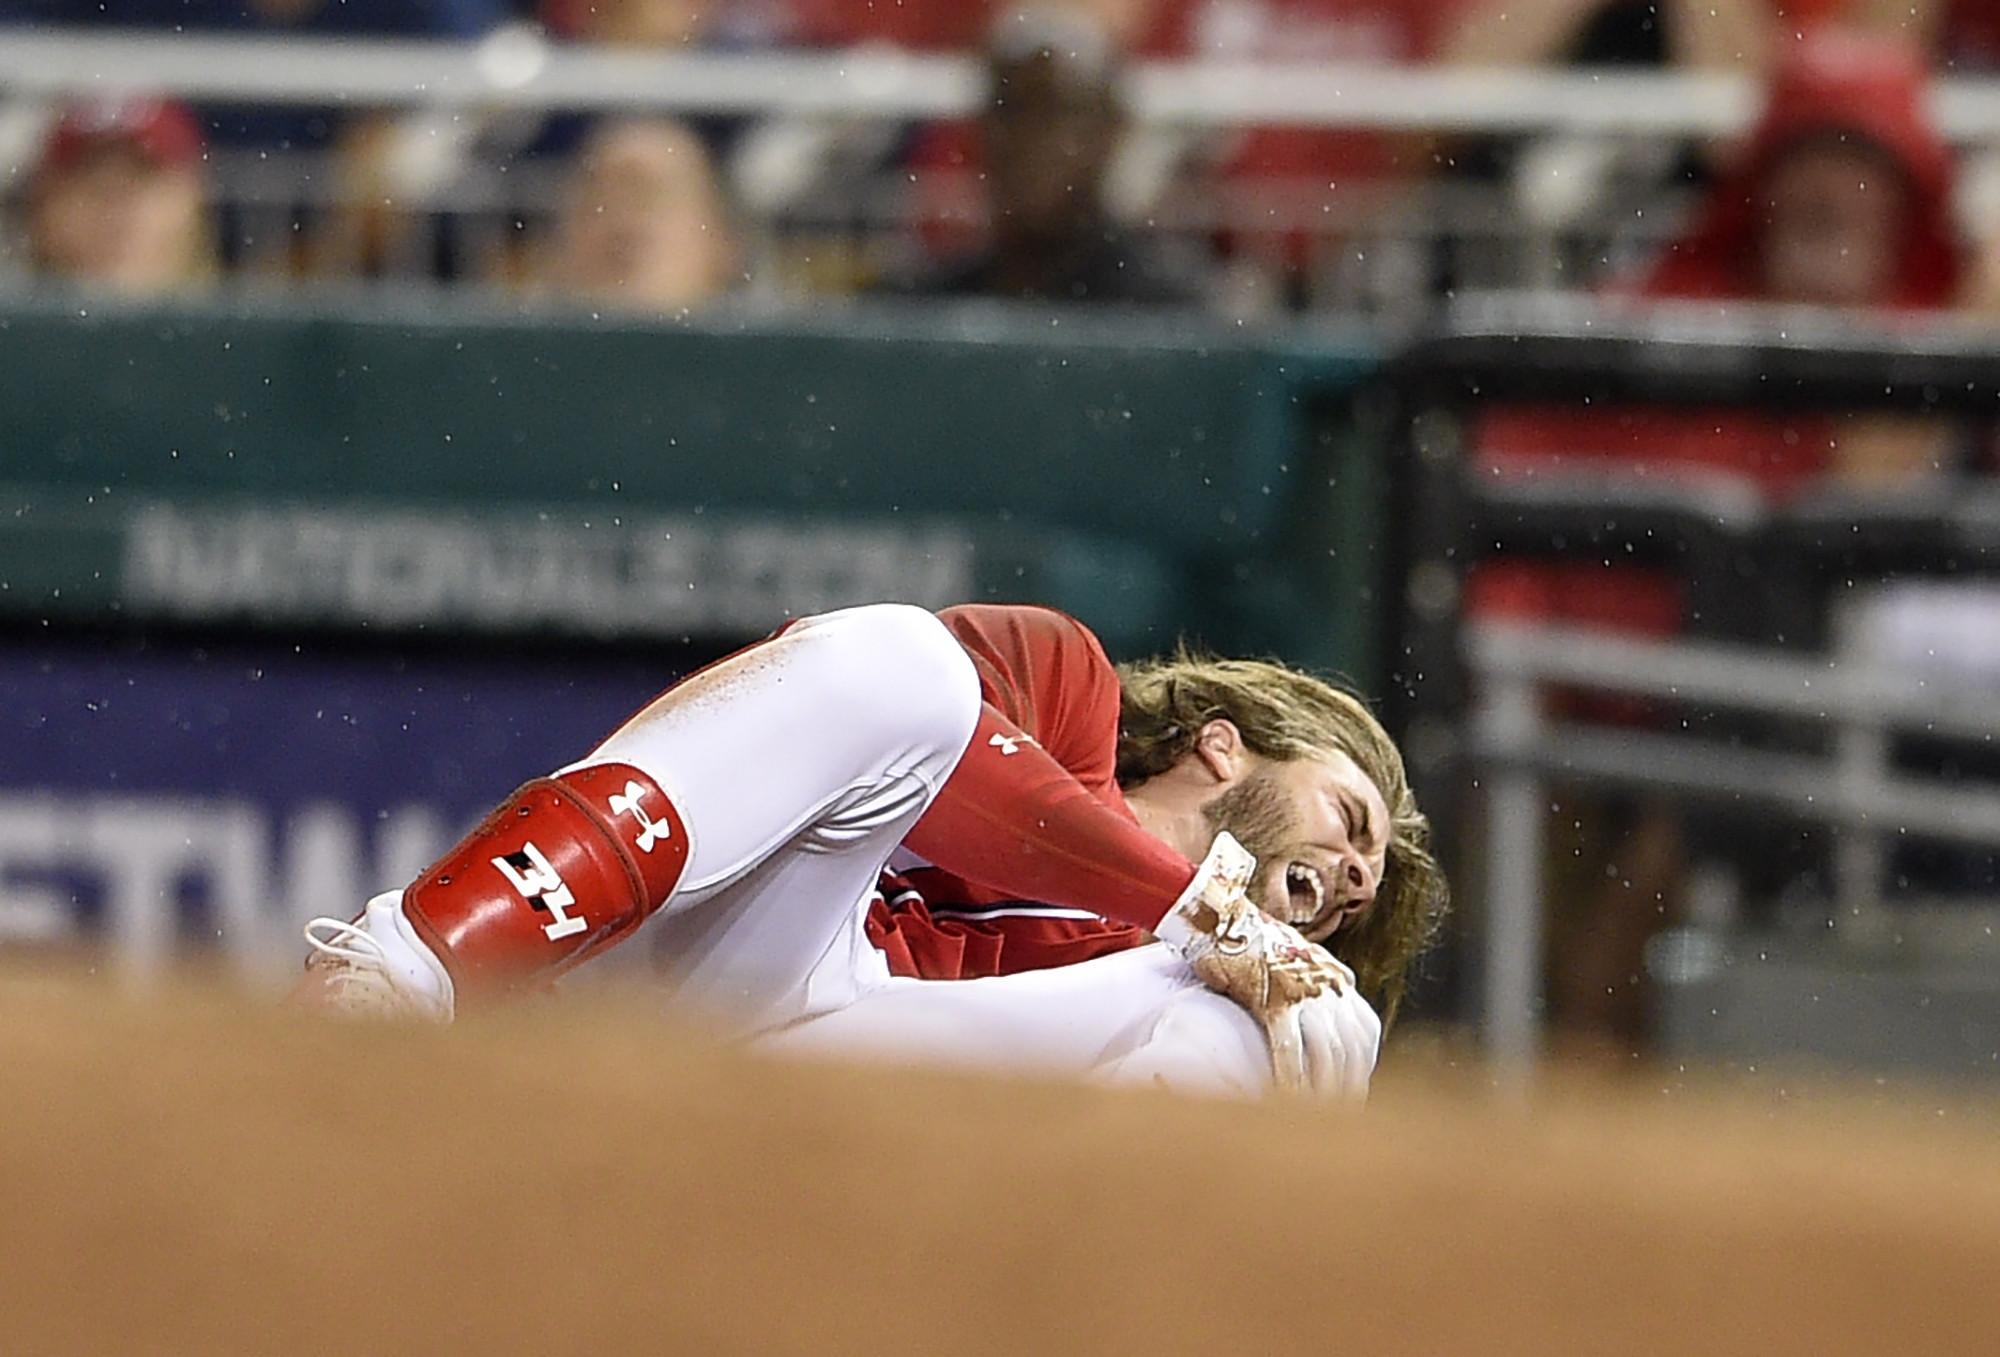 Bryce Harper has bone bruise, Nationals hopeful he's back this season - Chicago Tribune